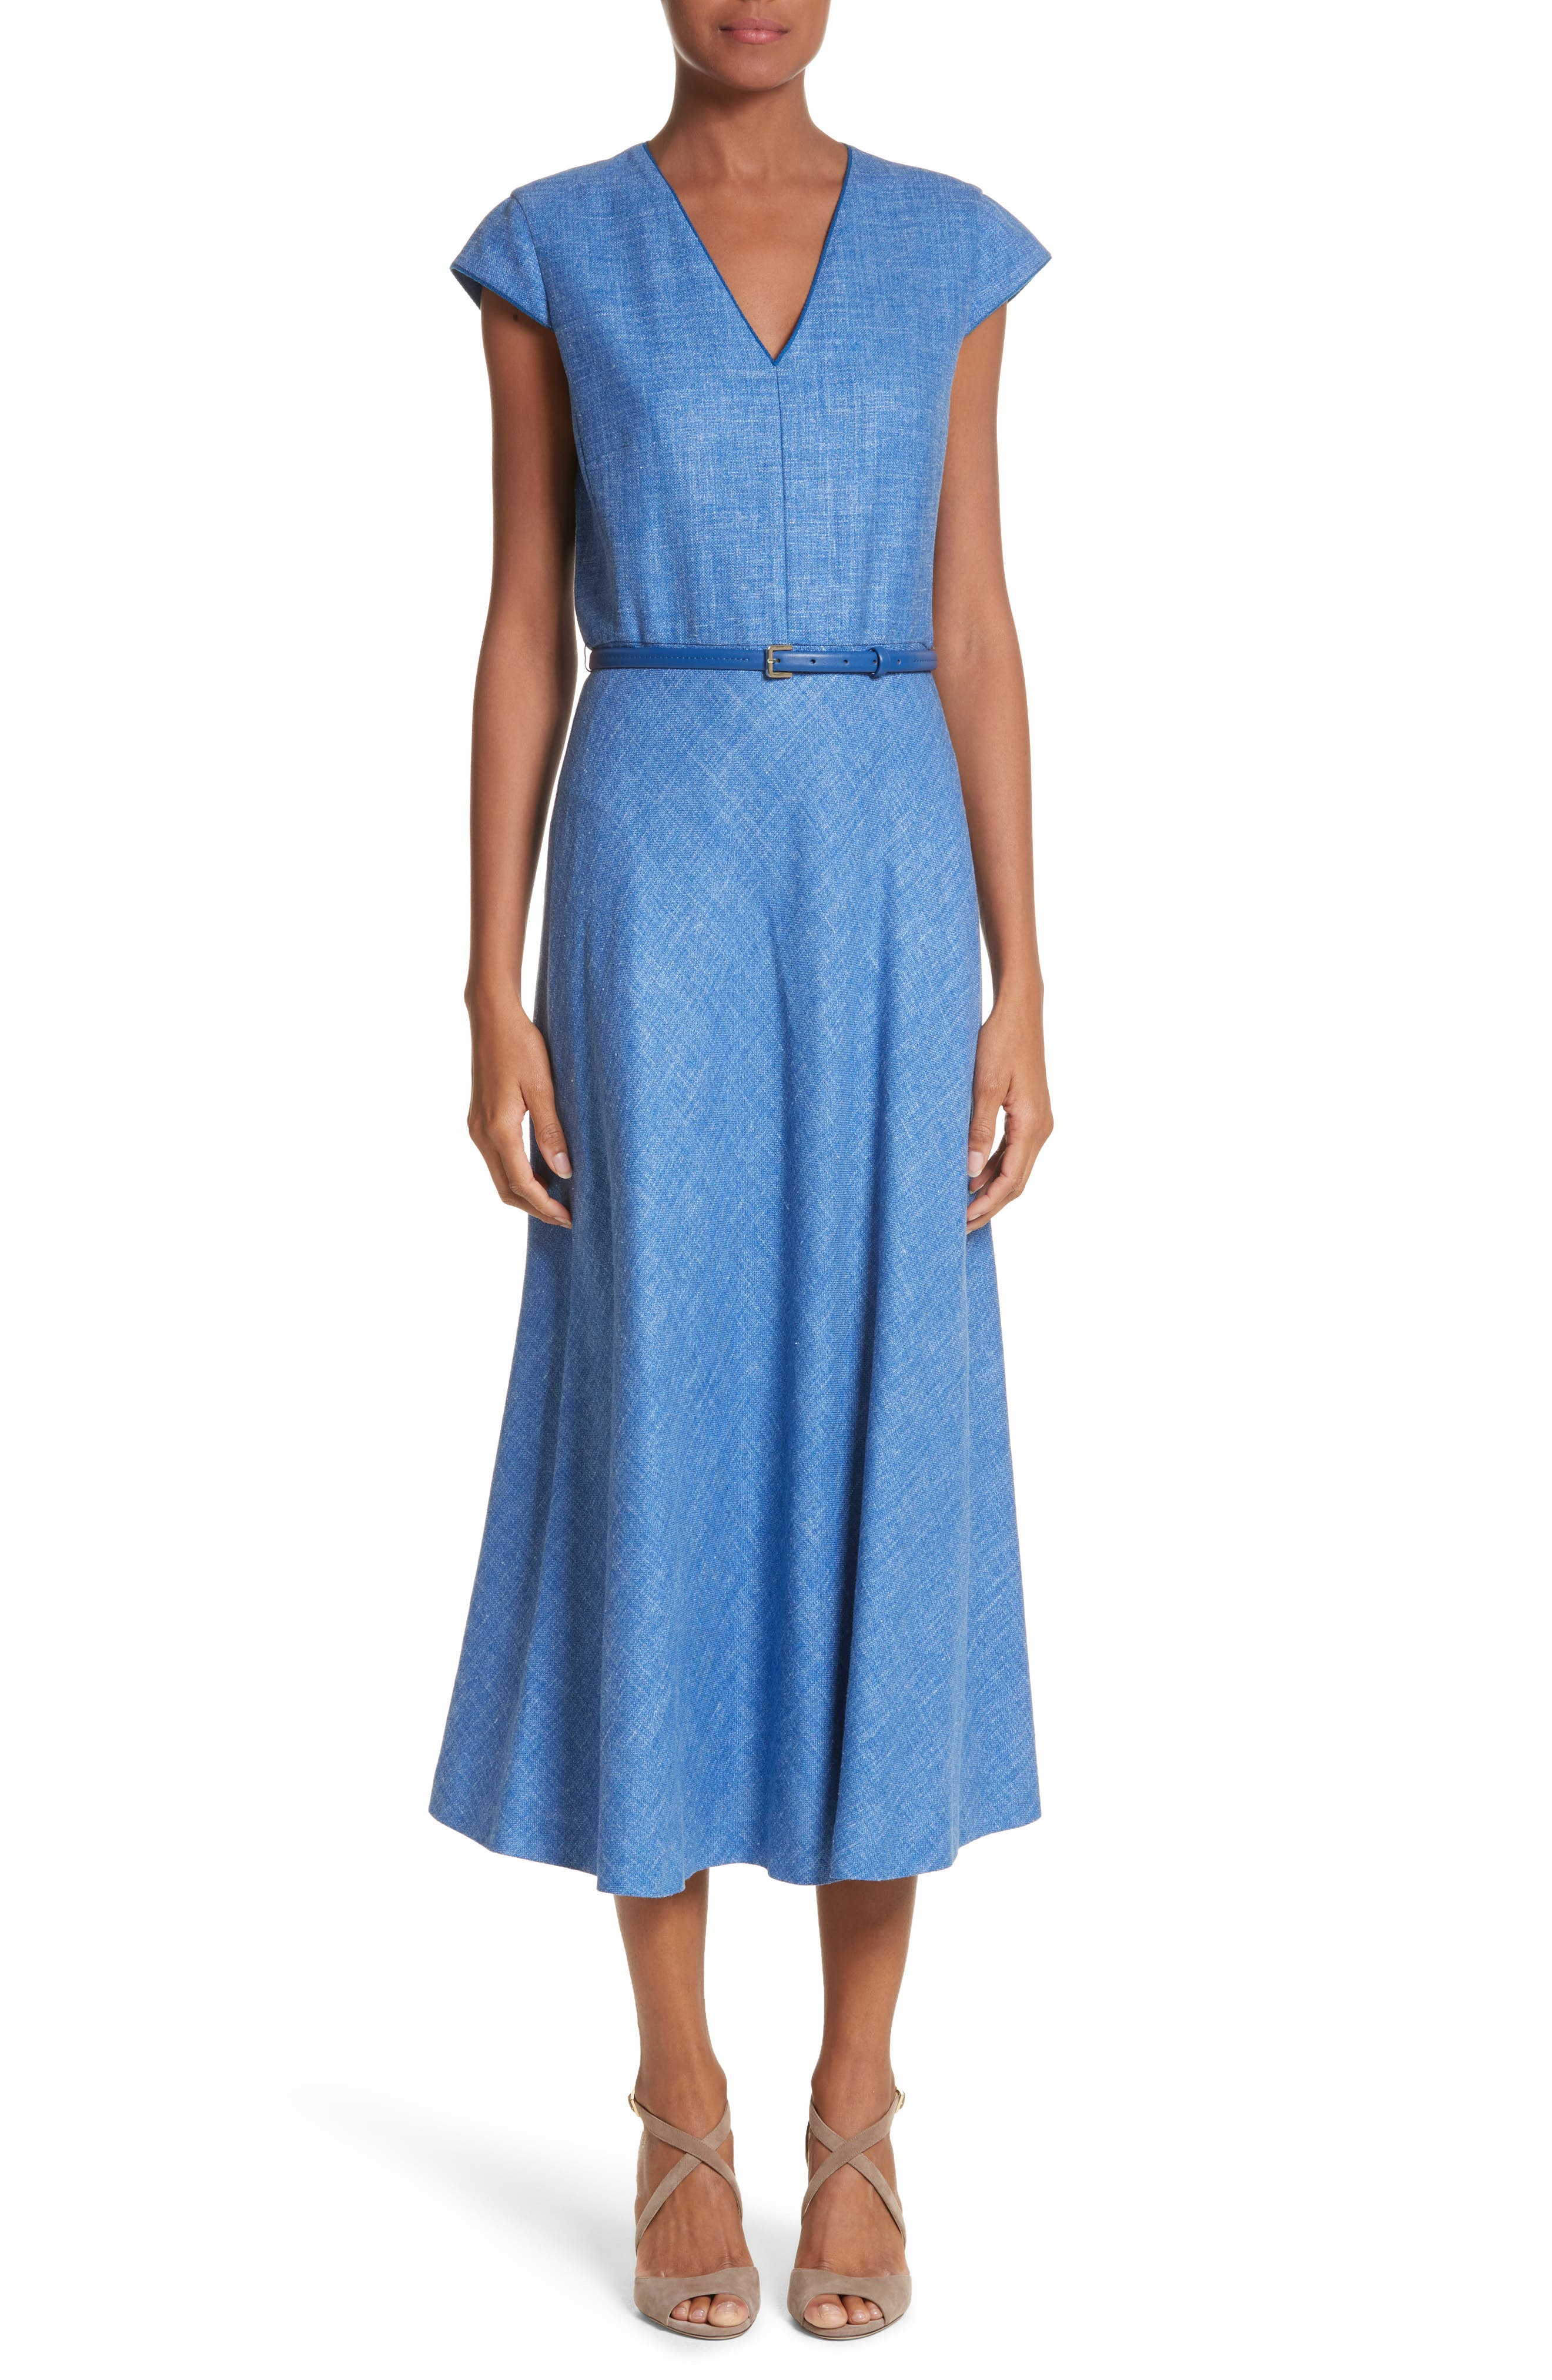 Caramba Silk, Linen & Wool Midi Dress,                             Main thumbnail 1, color,                             404